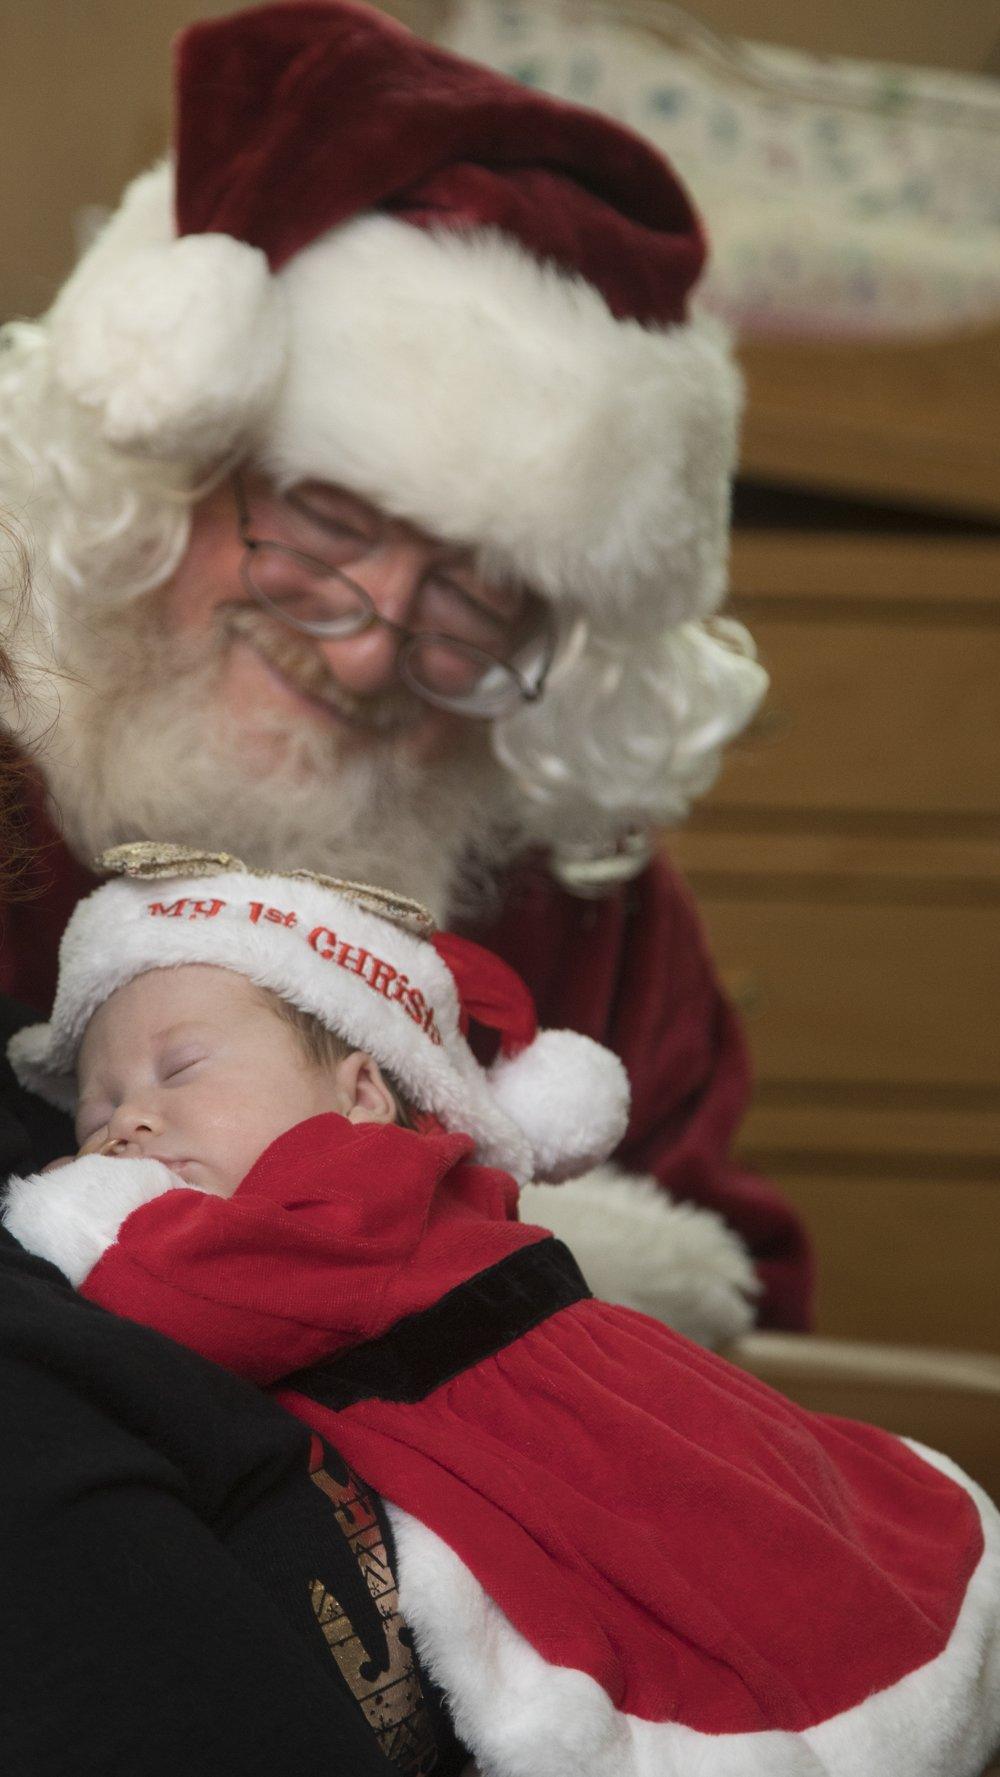 Santa visits the NICU